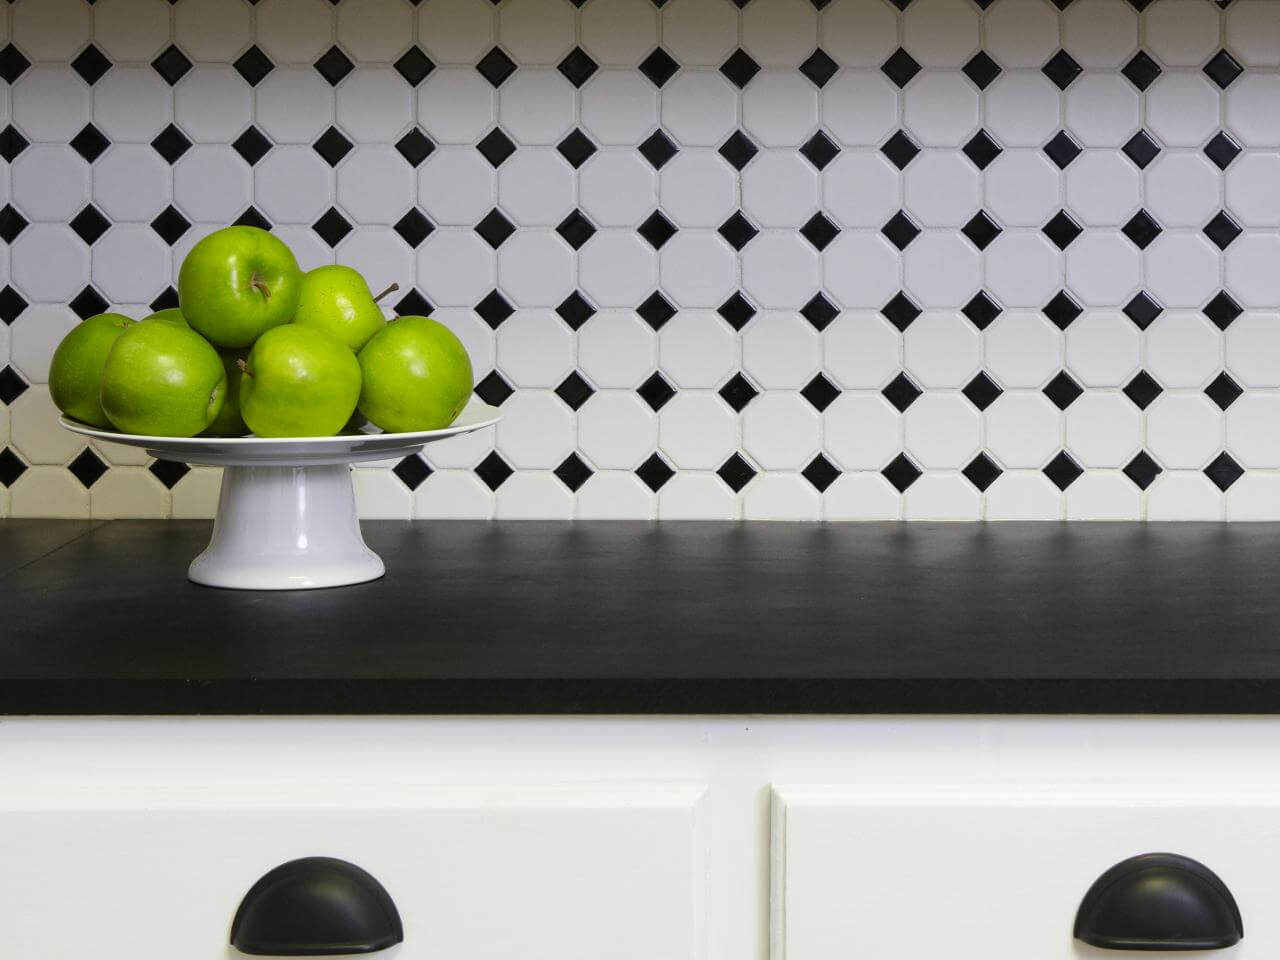 Modern kitchen splashback in black and white